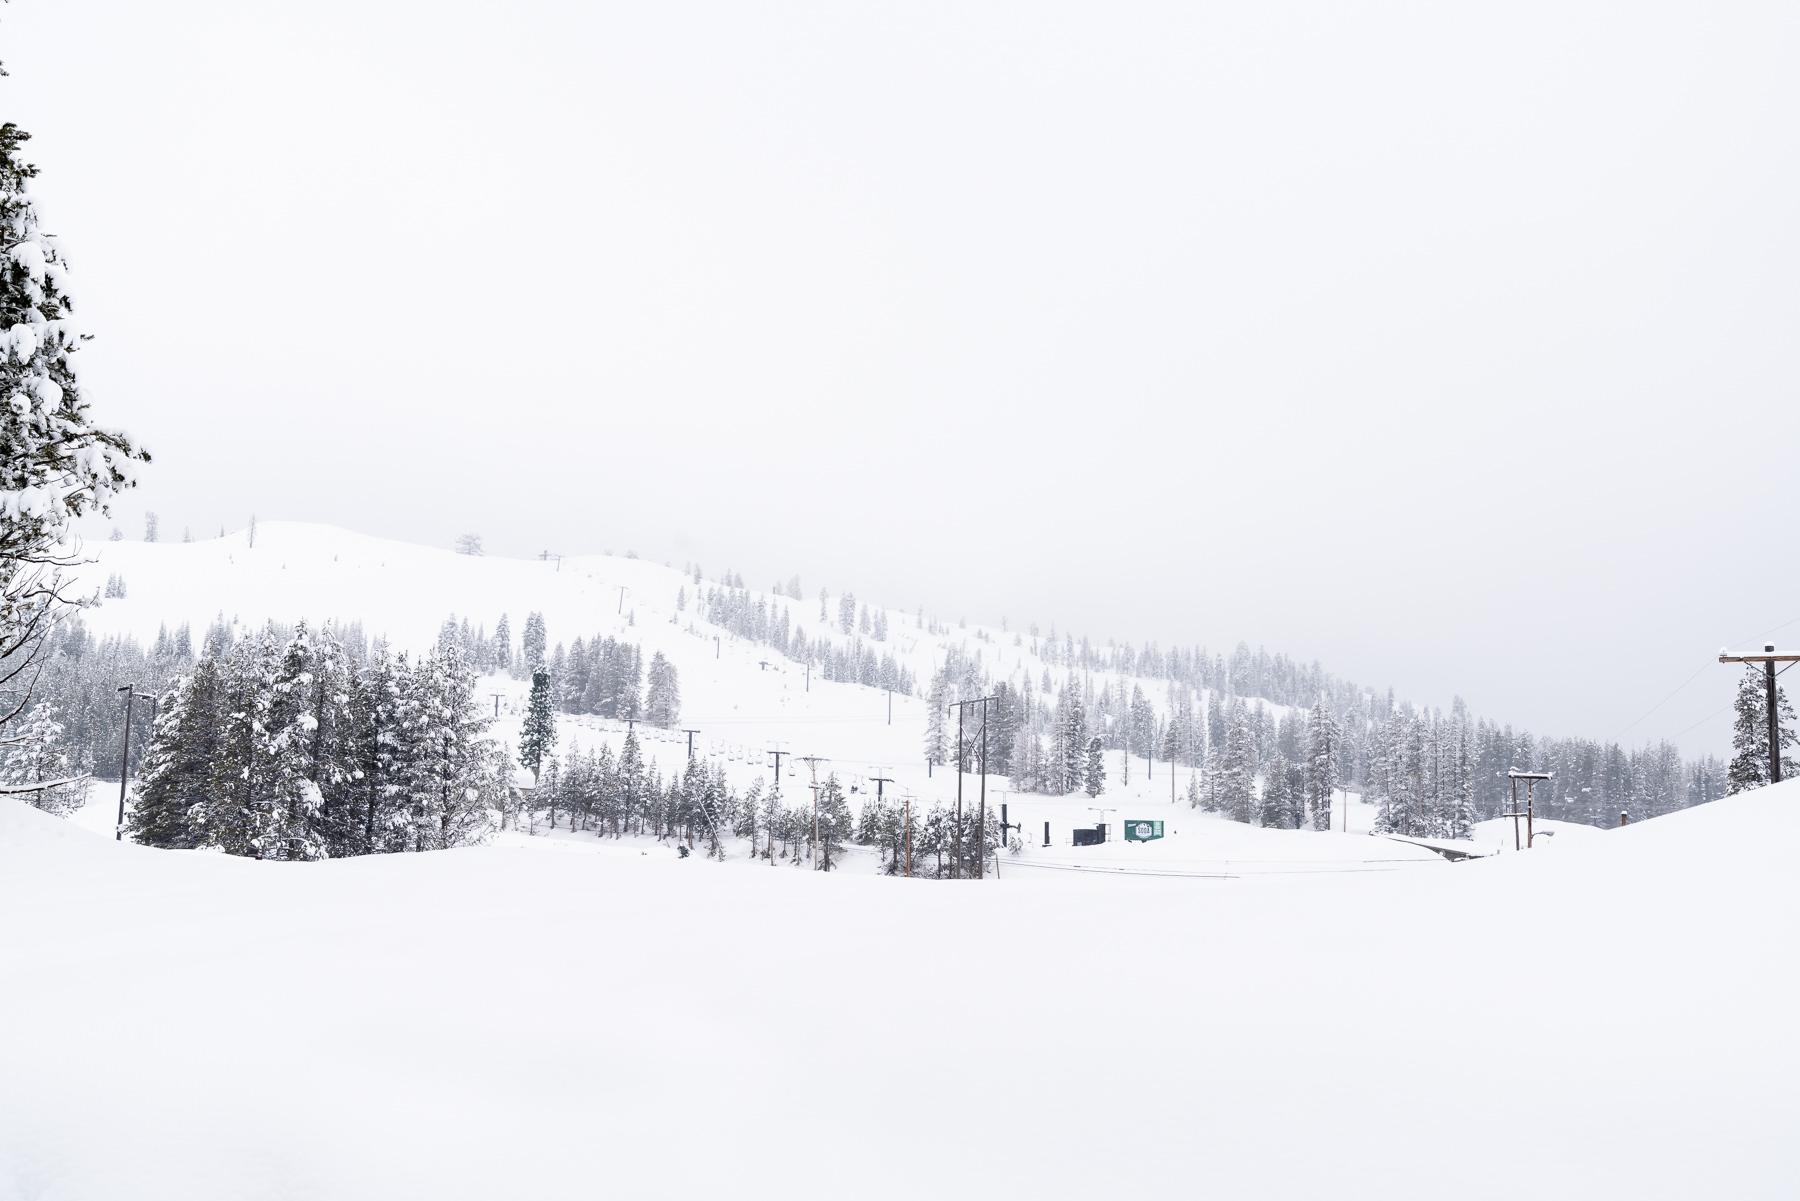 2019.03.23 Snowy Tahoe © Jennifer Carr Photography-13.jpg